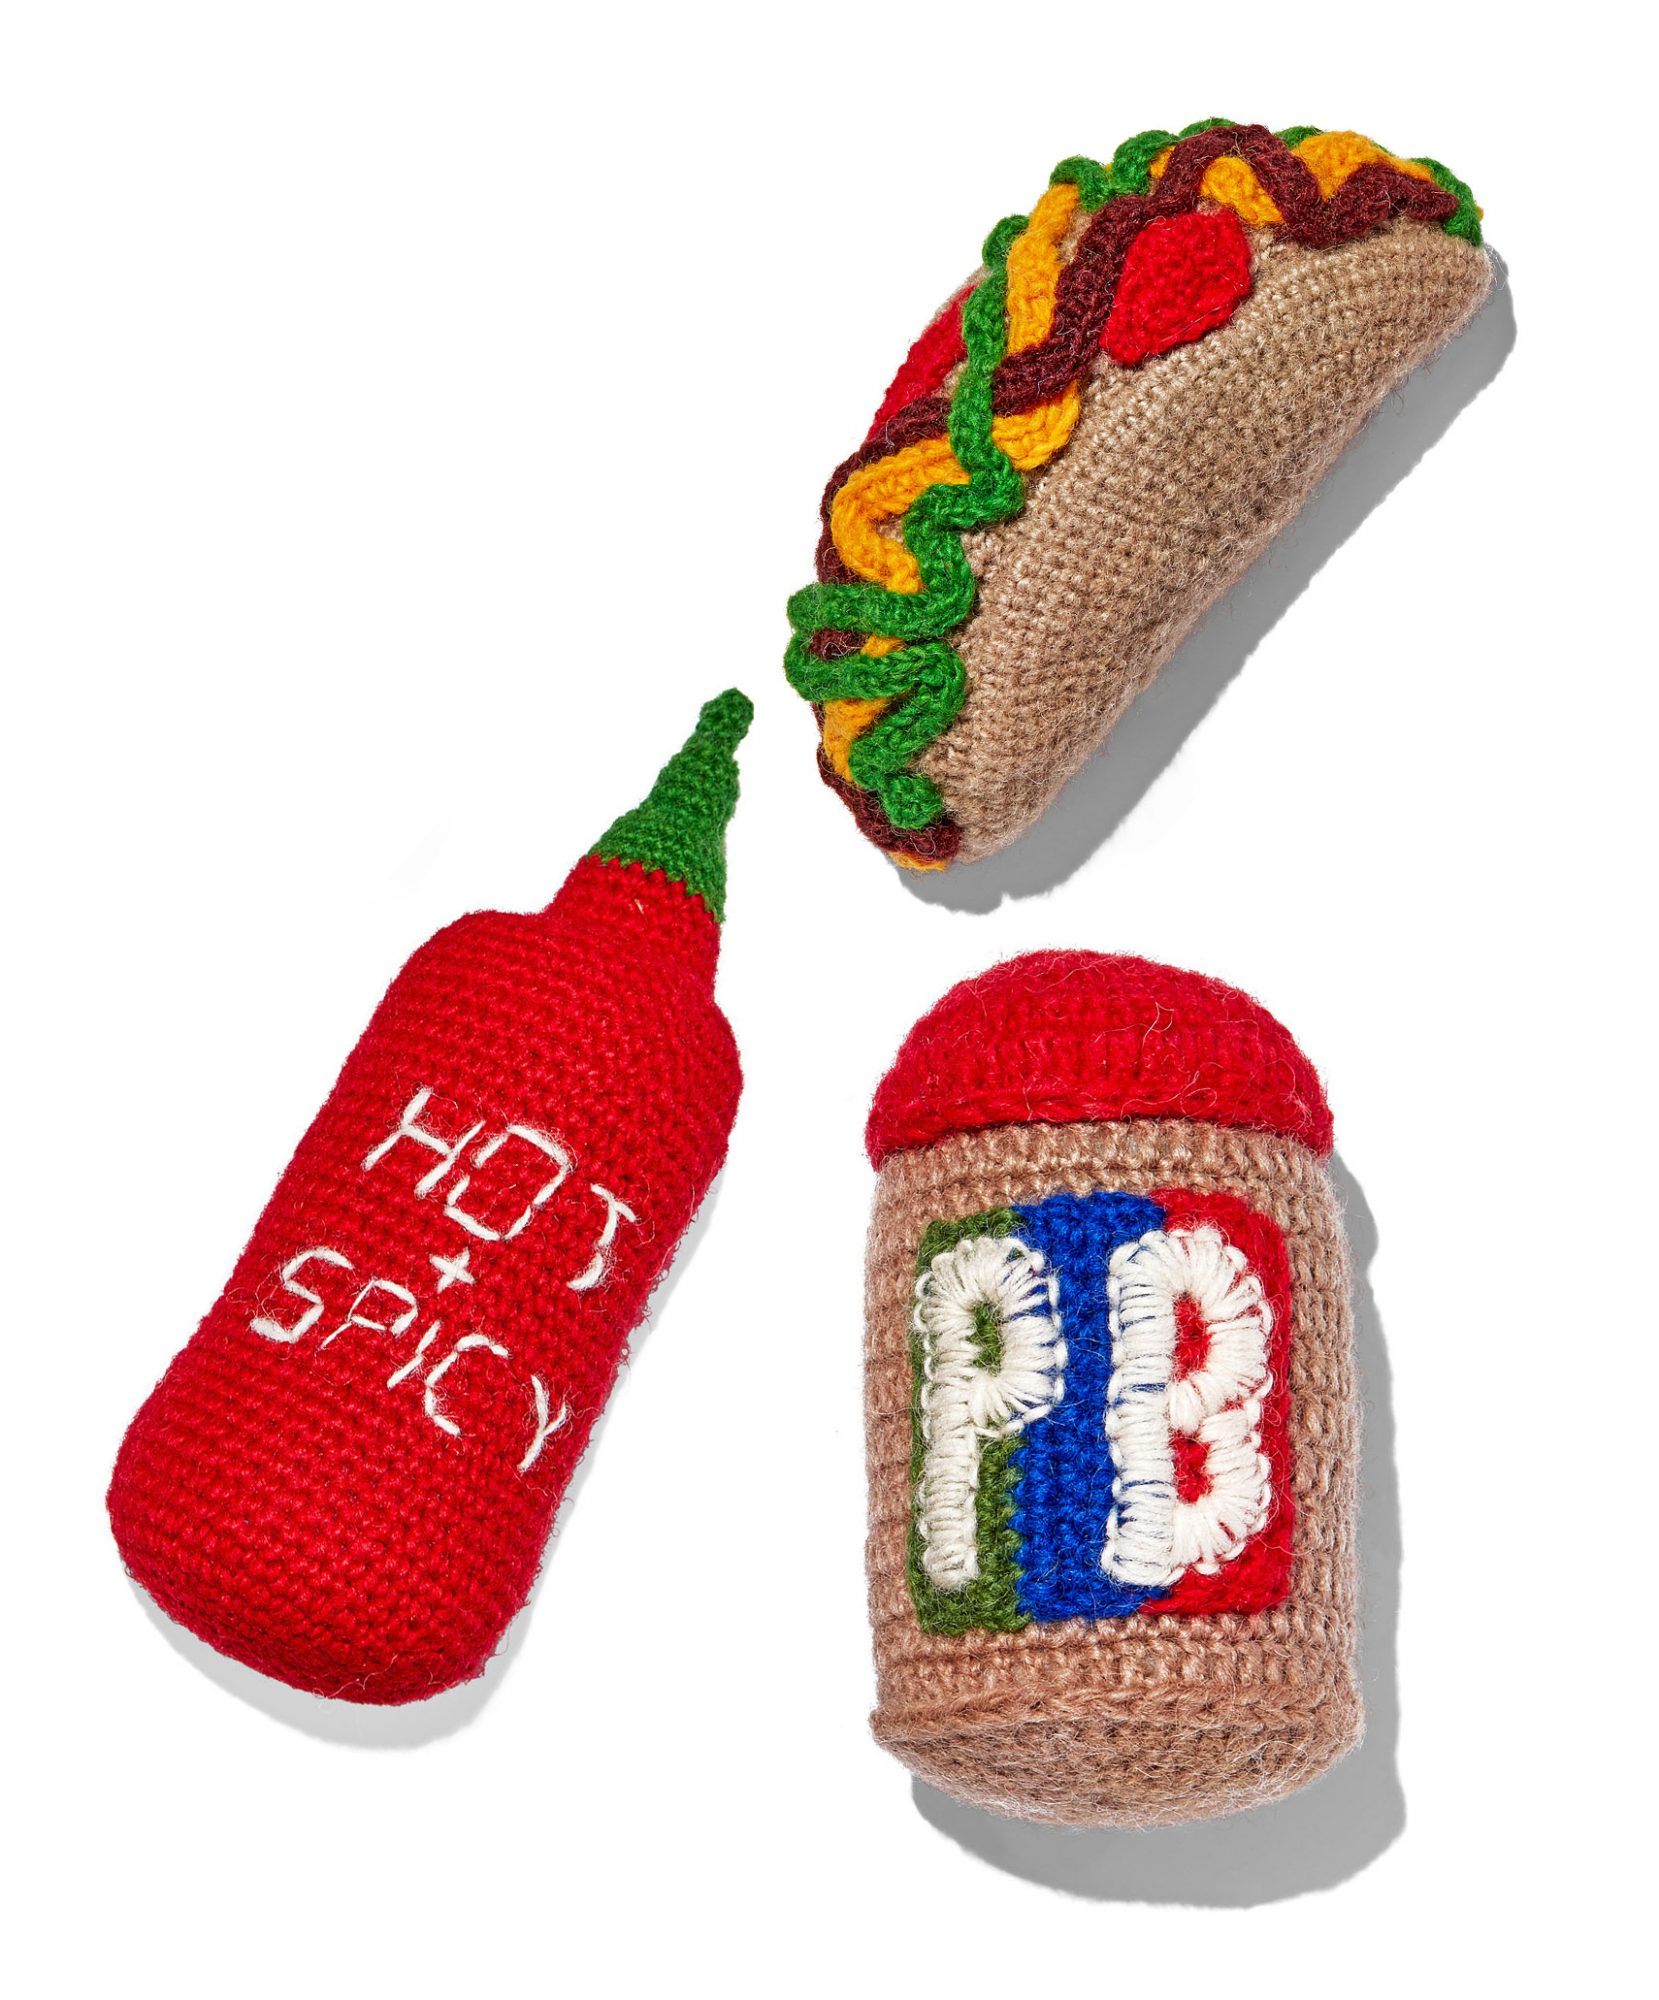 hand knit dog toys